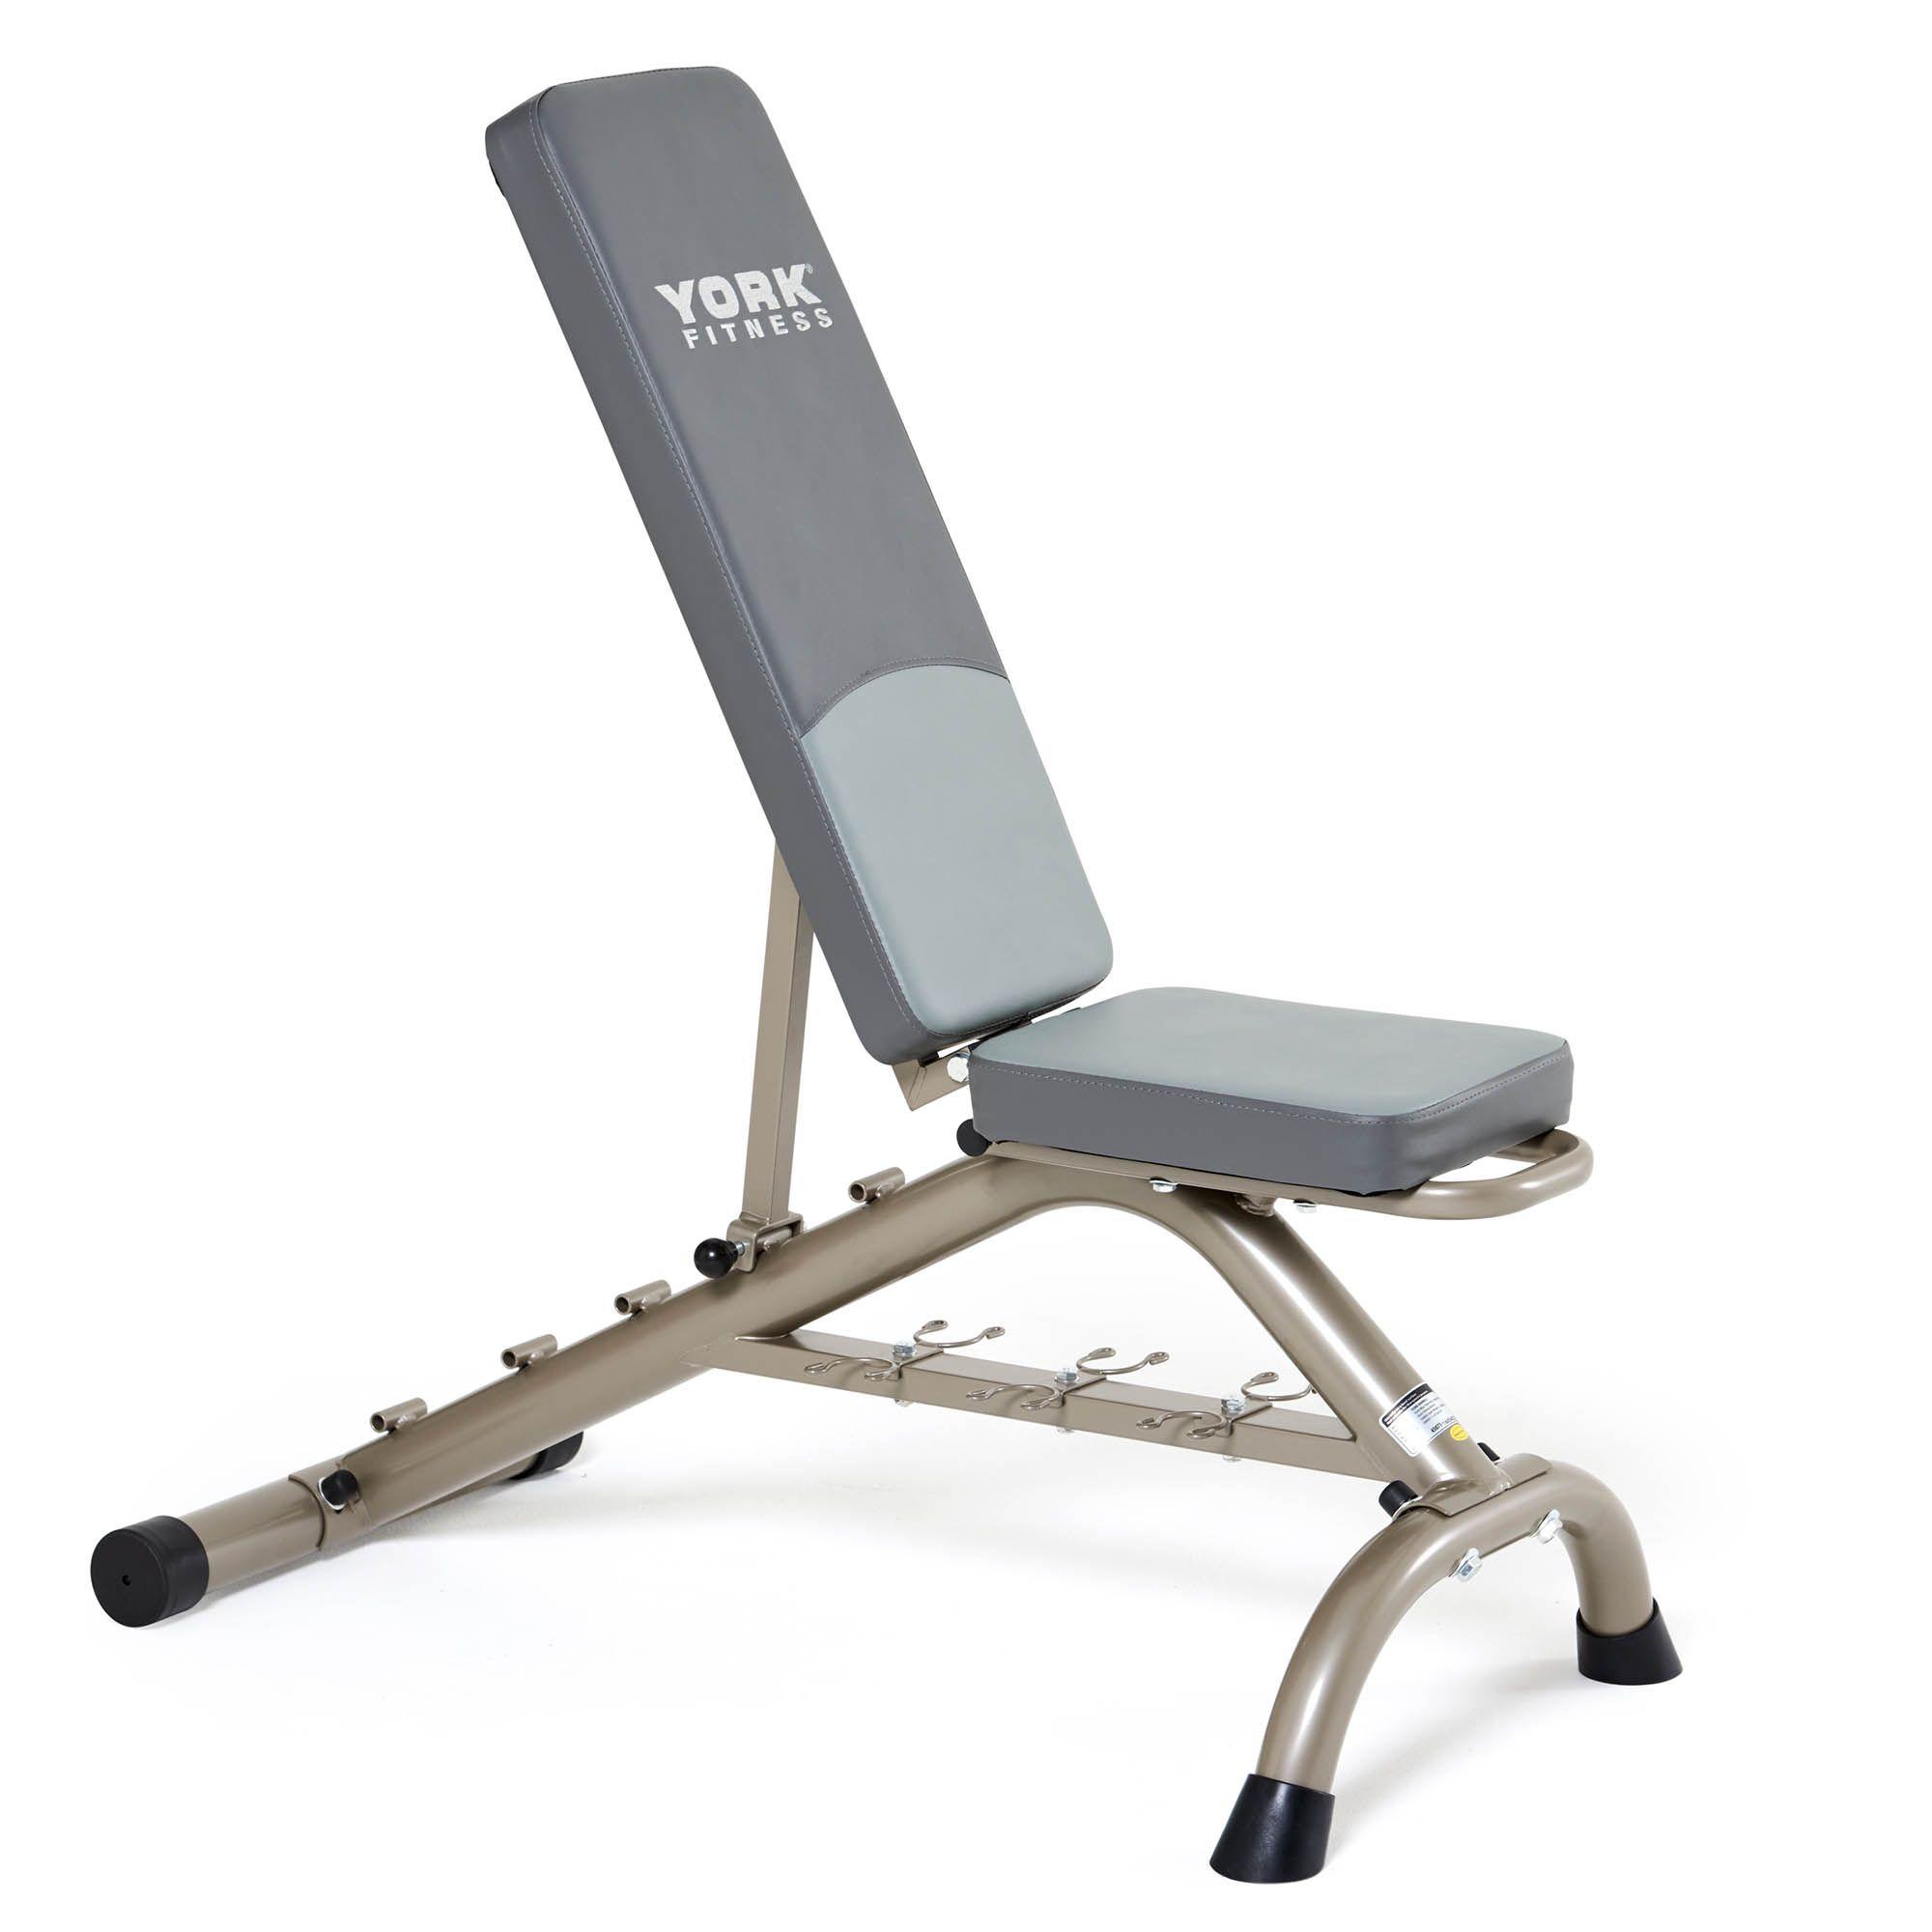 gym bench press chair office under 2000 york fitness